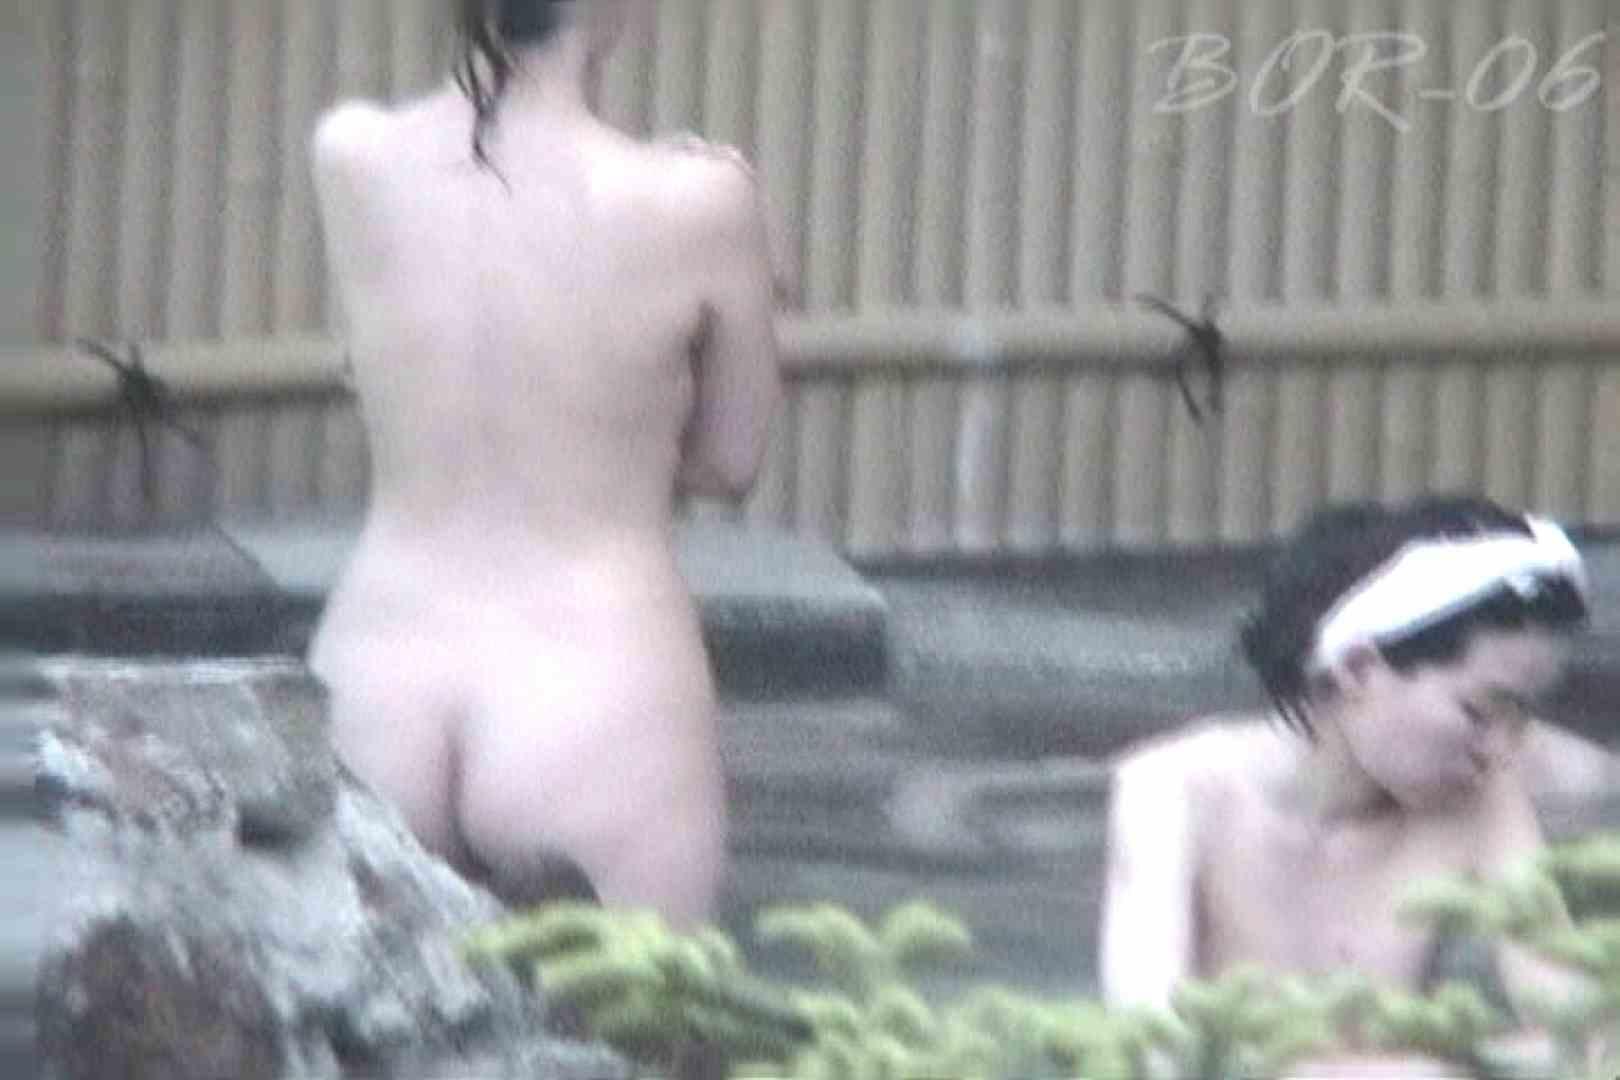 Aquaな露天風呂Vol.519 露天風呂突入 のぞき動画画像 102pic 44